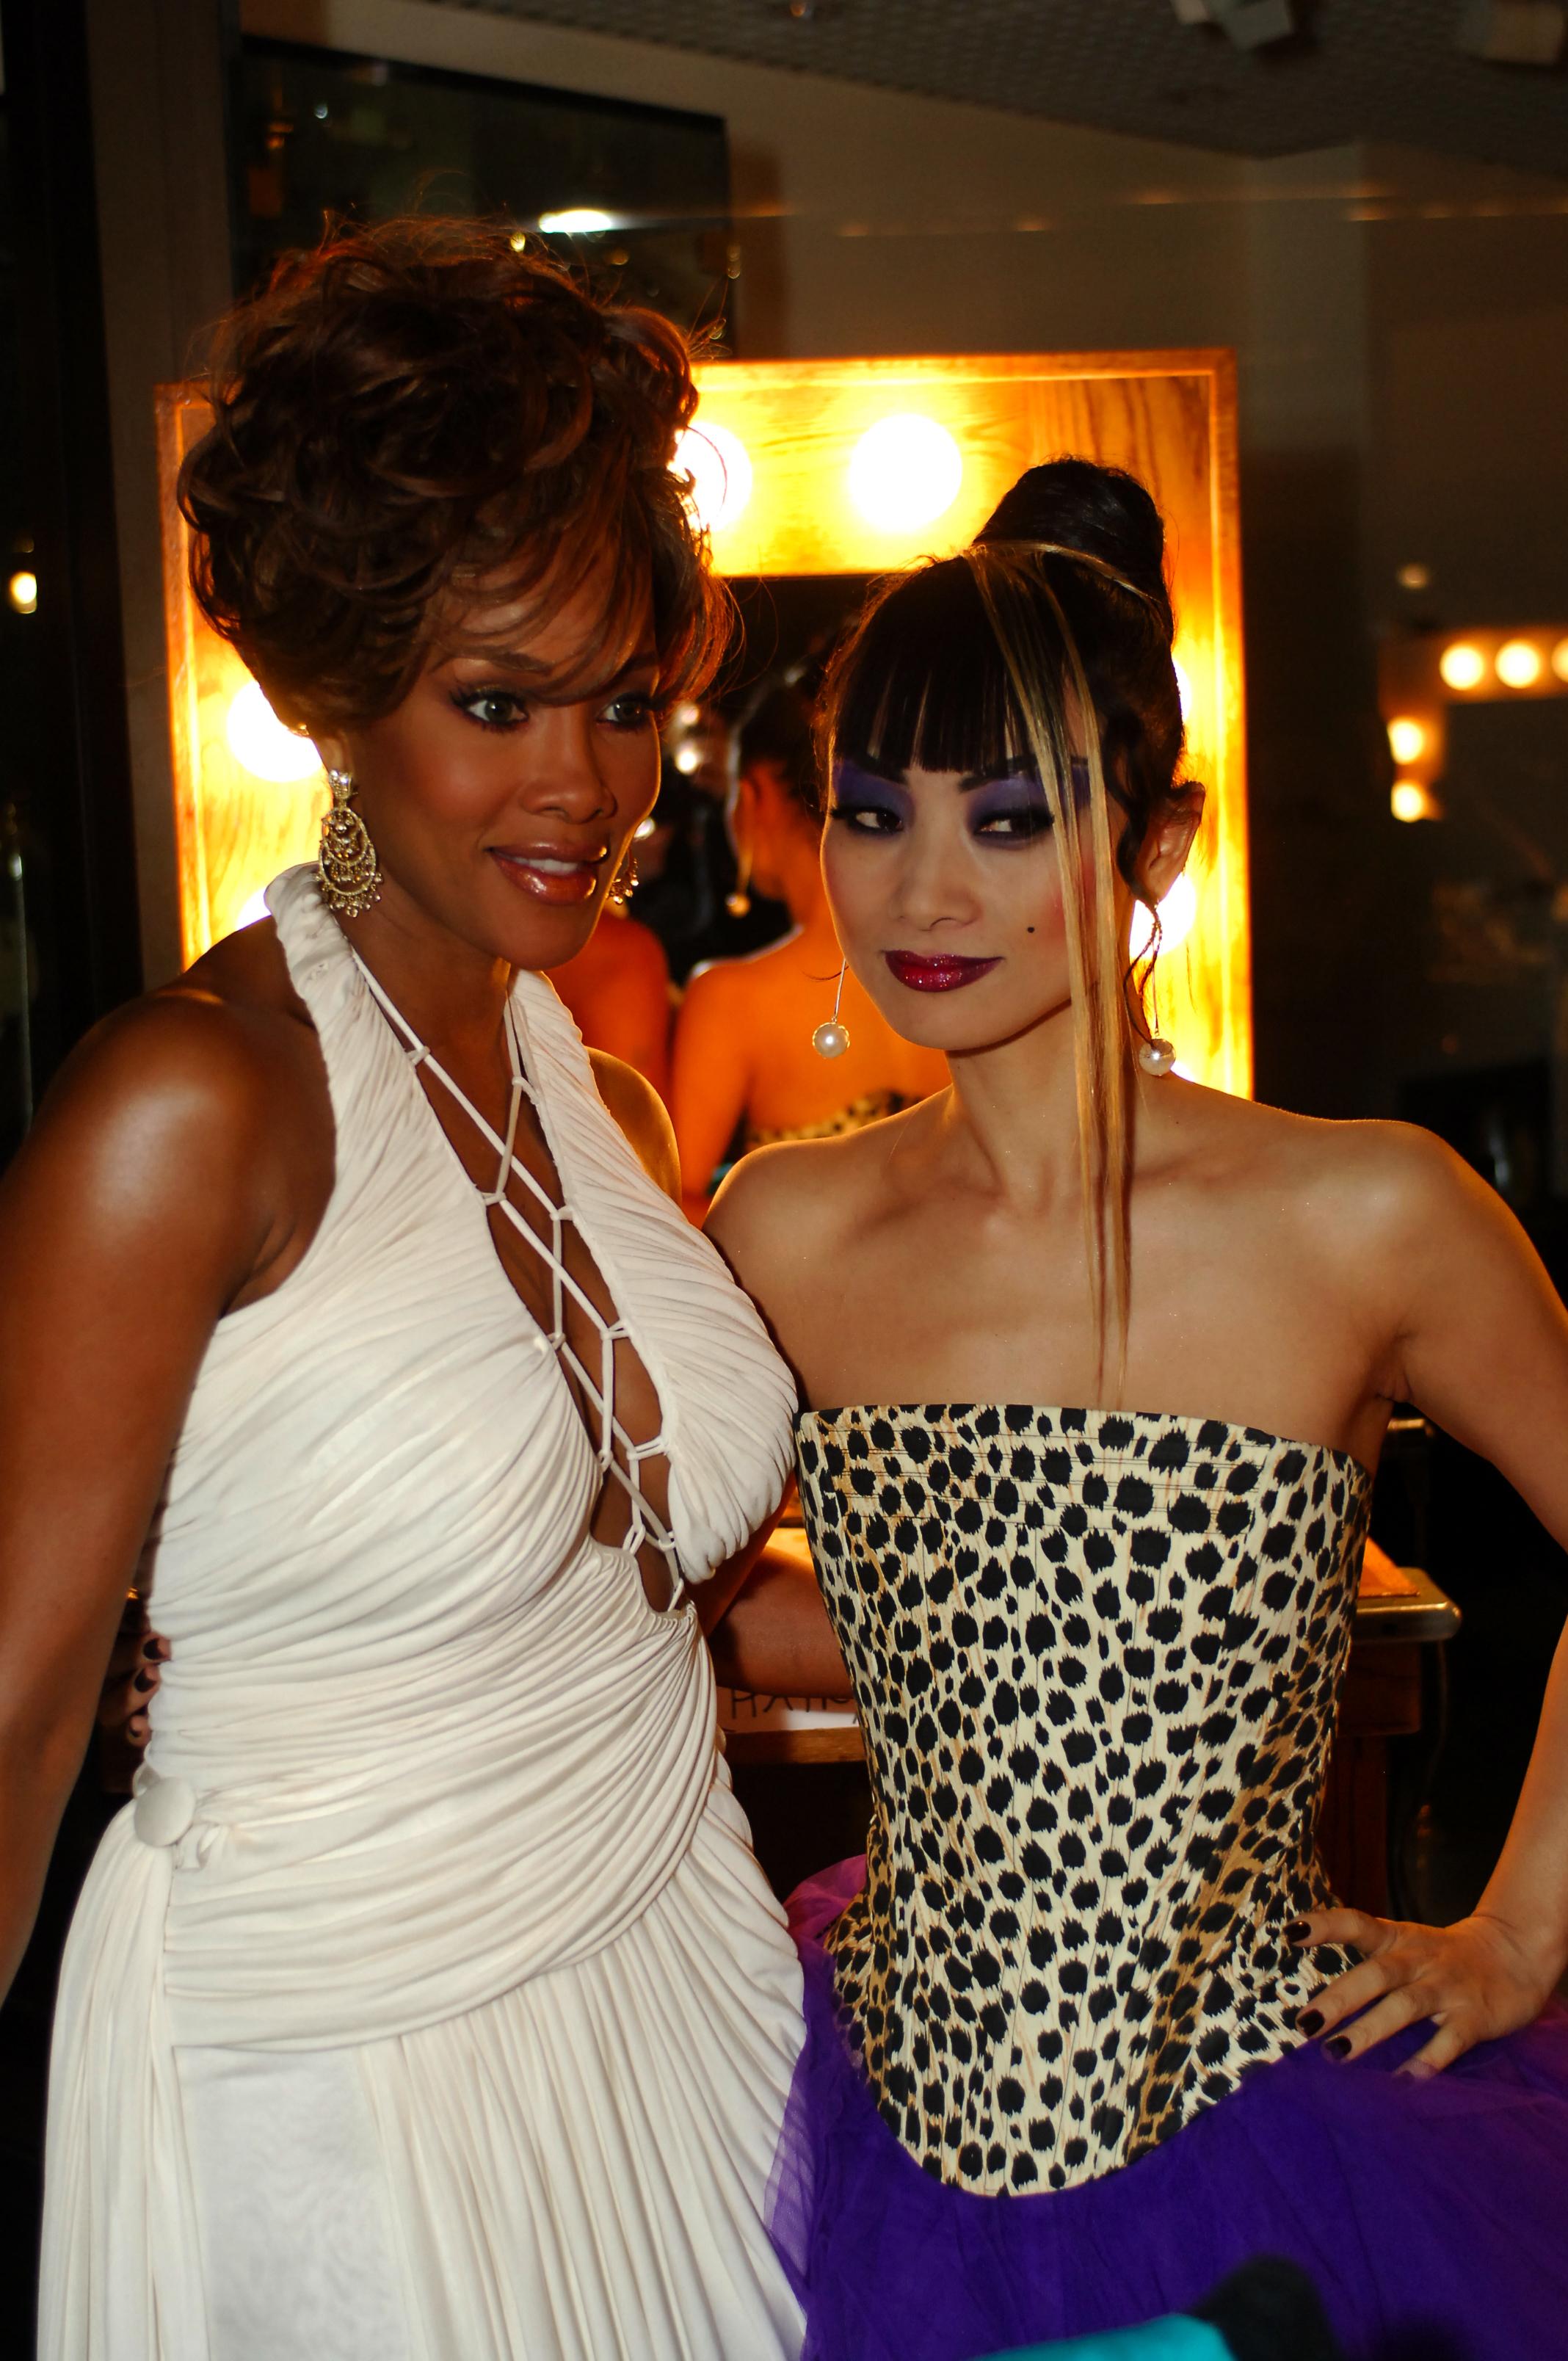 Vica Fox and Bai Ling